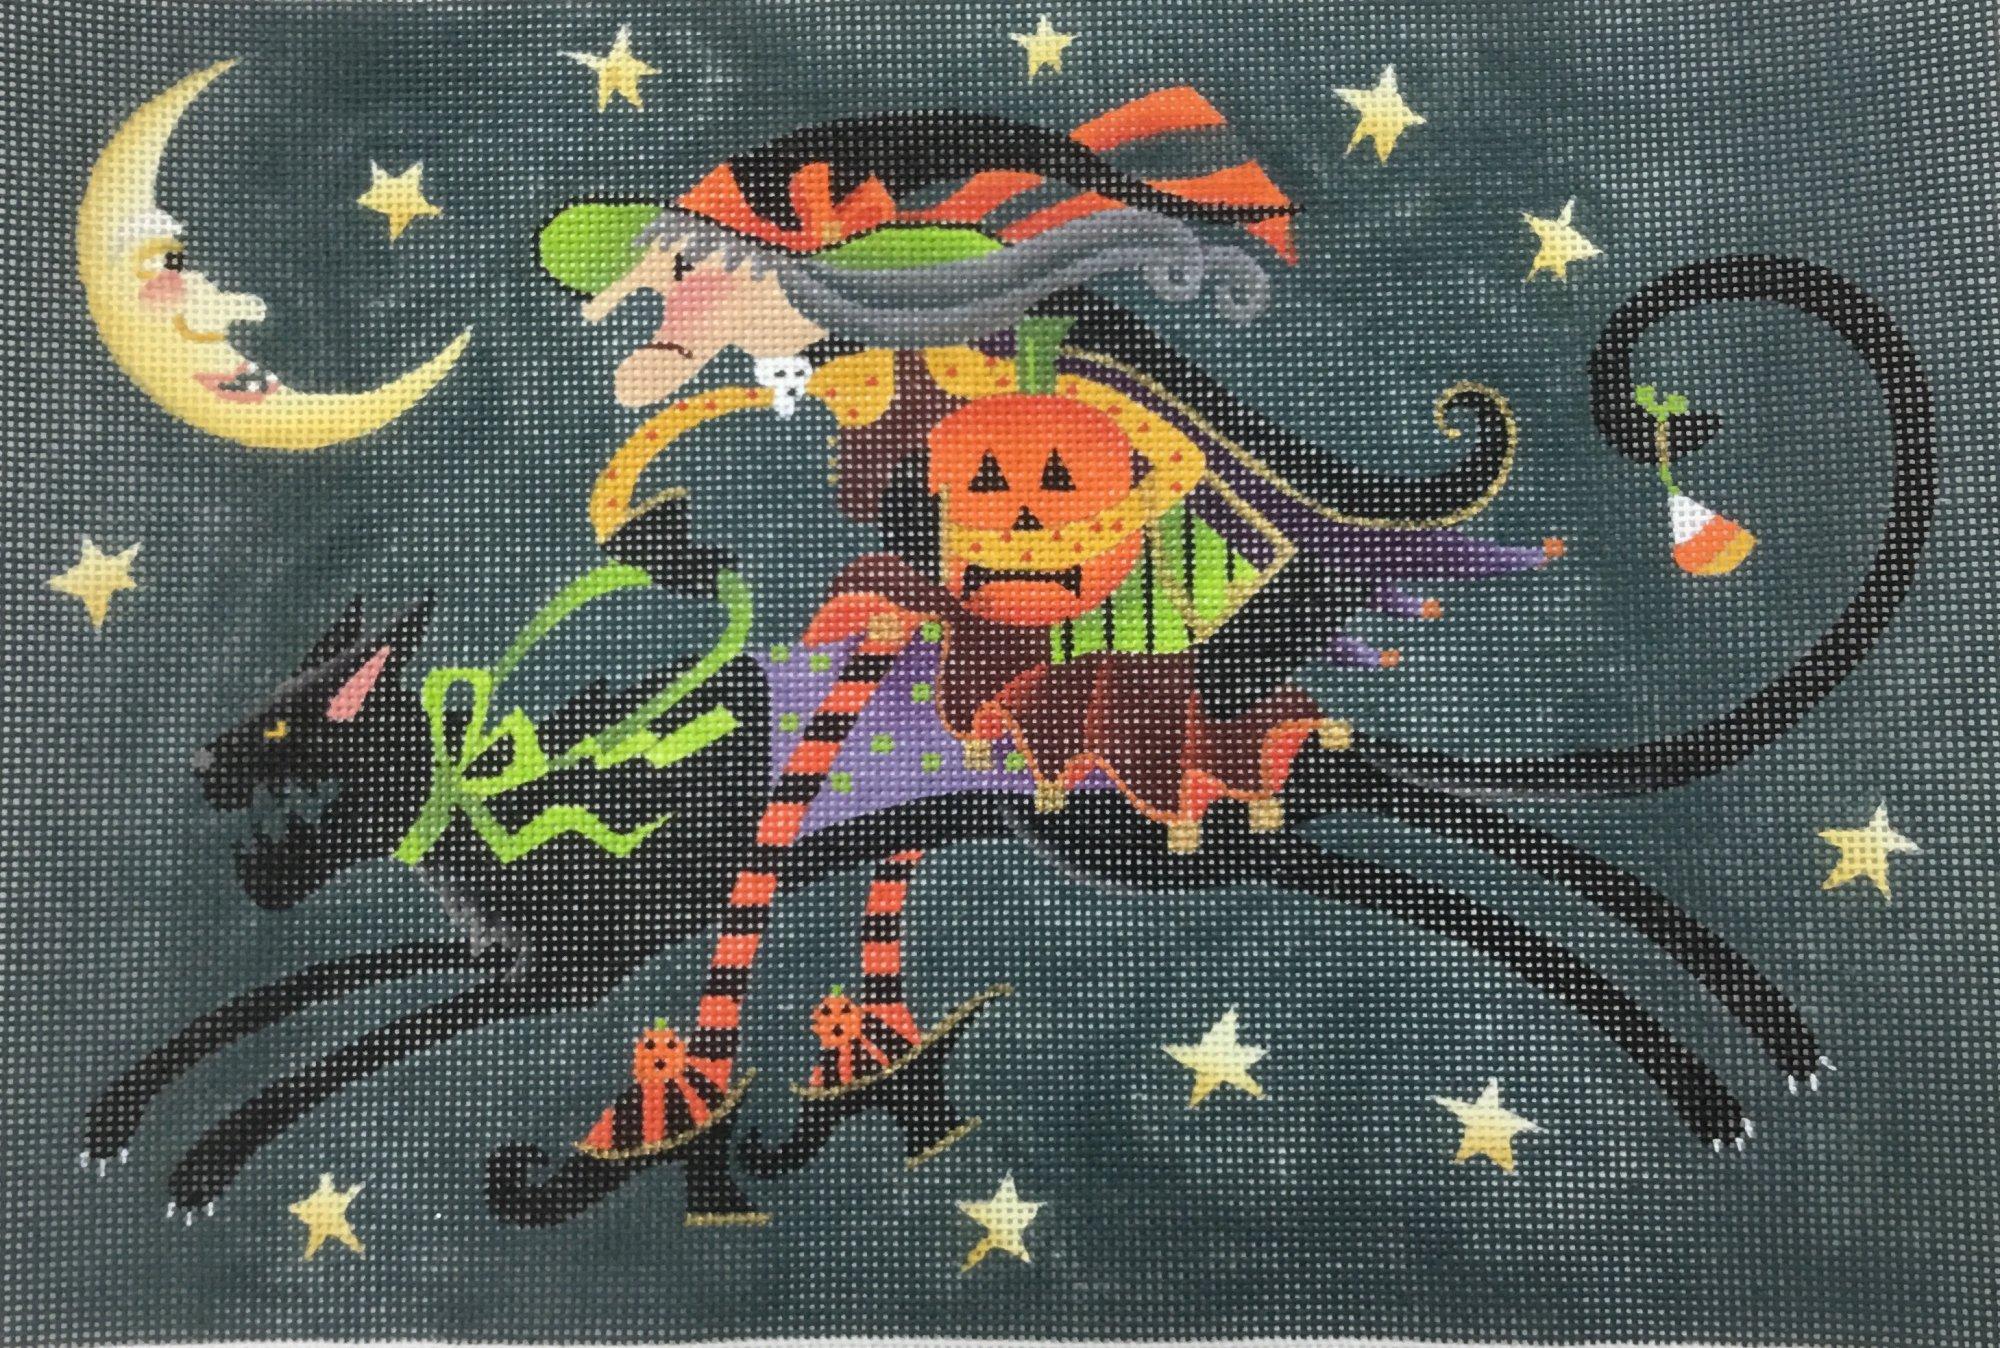 Crabby Cat Witch,13 ct.,10x15